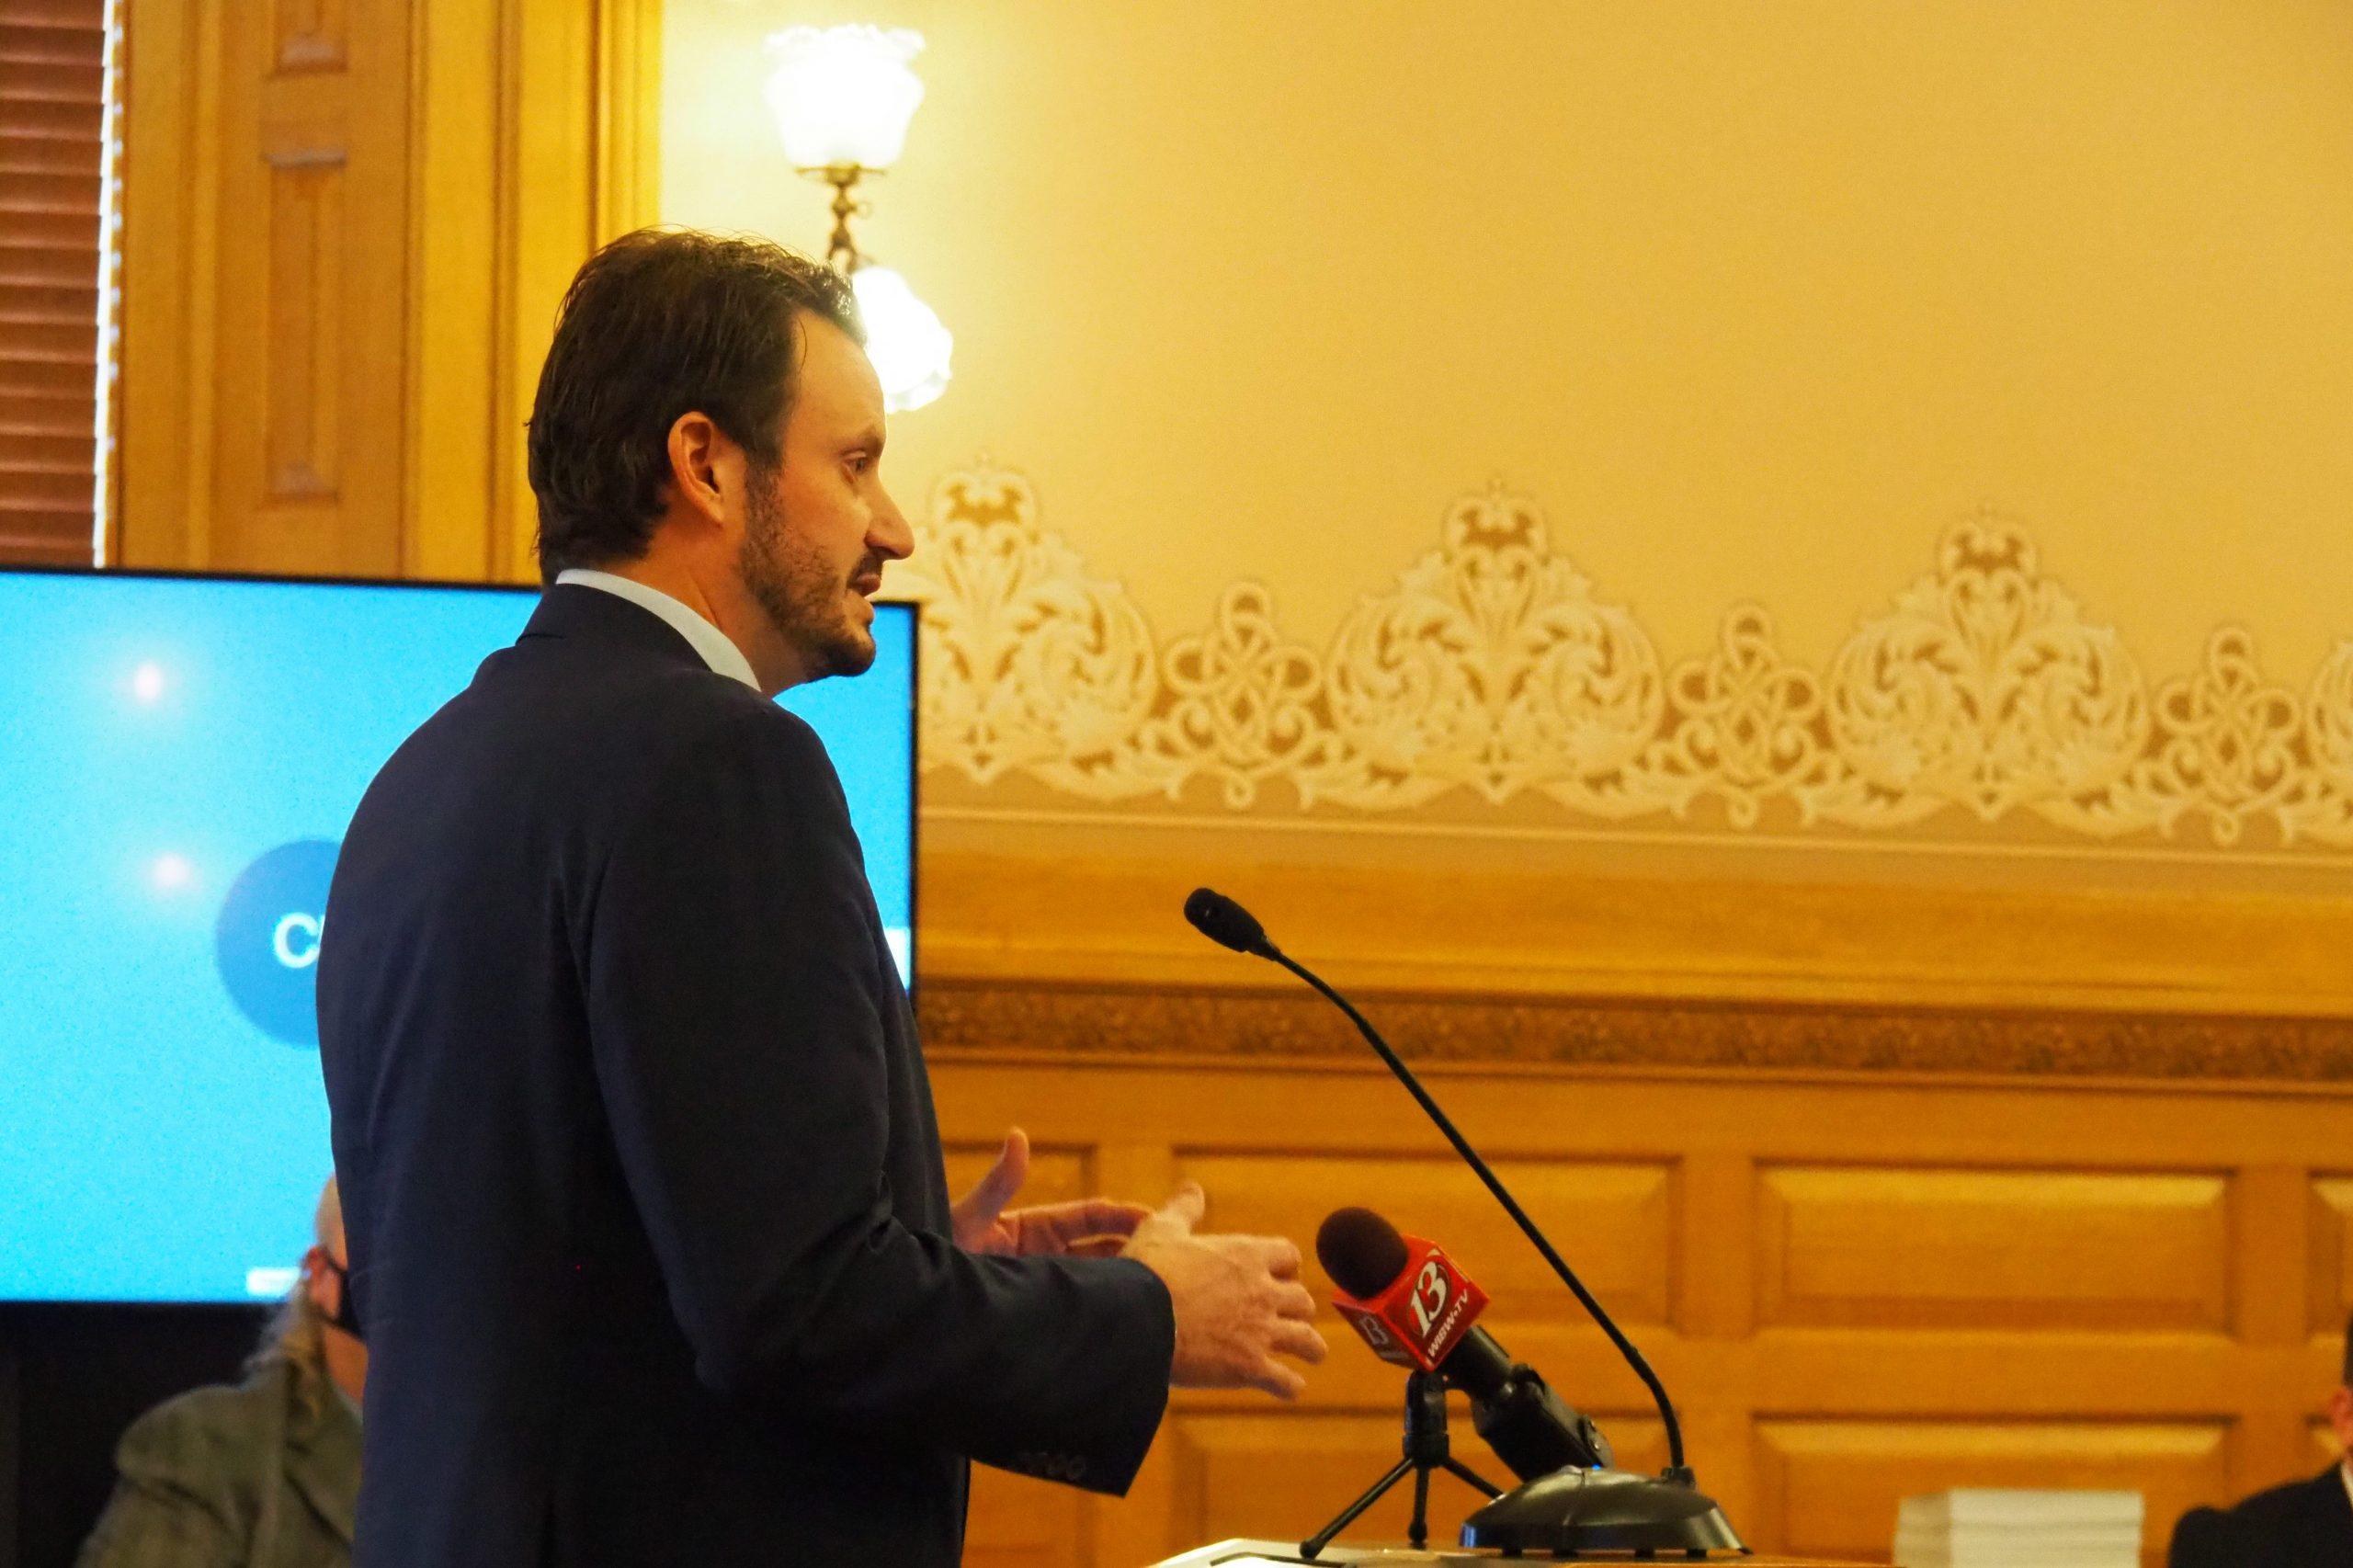 House bill seeks to rehab Kansas unemployment system, establish oversight council